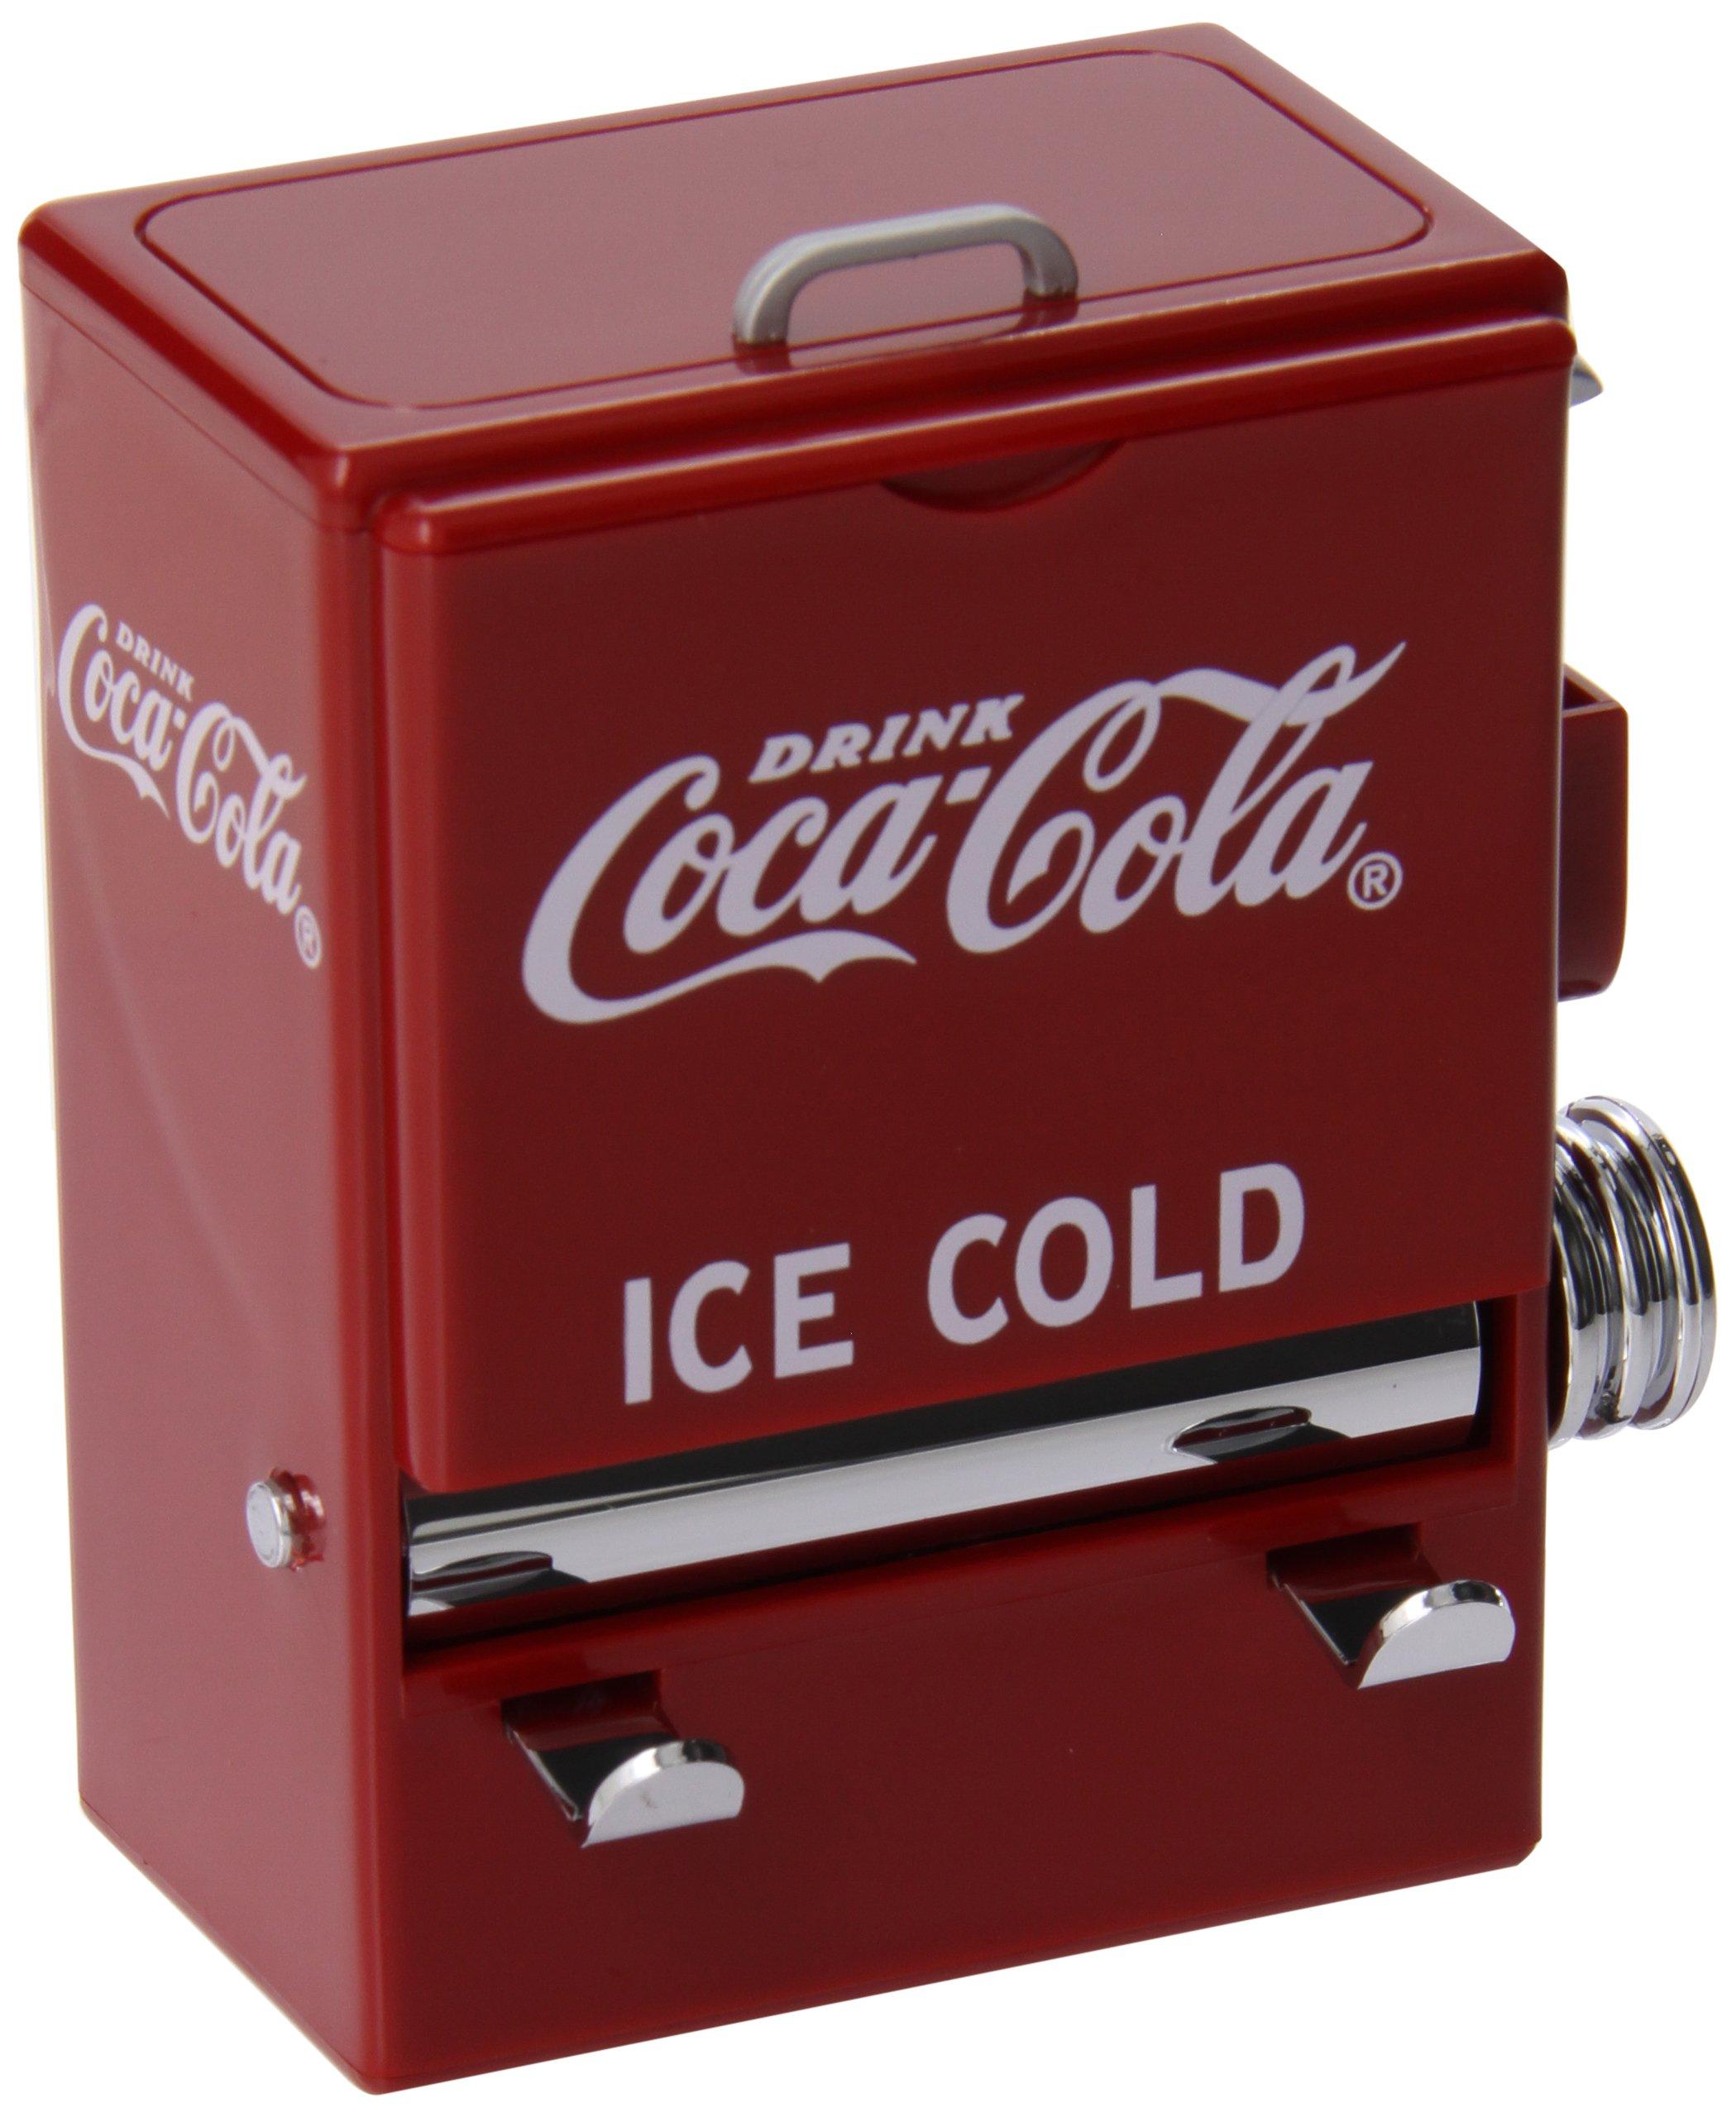 TableCraft Coca-Cola CC304 Vending Machine Toothpick Dispenser by Tablecraft